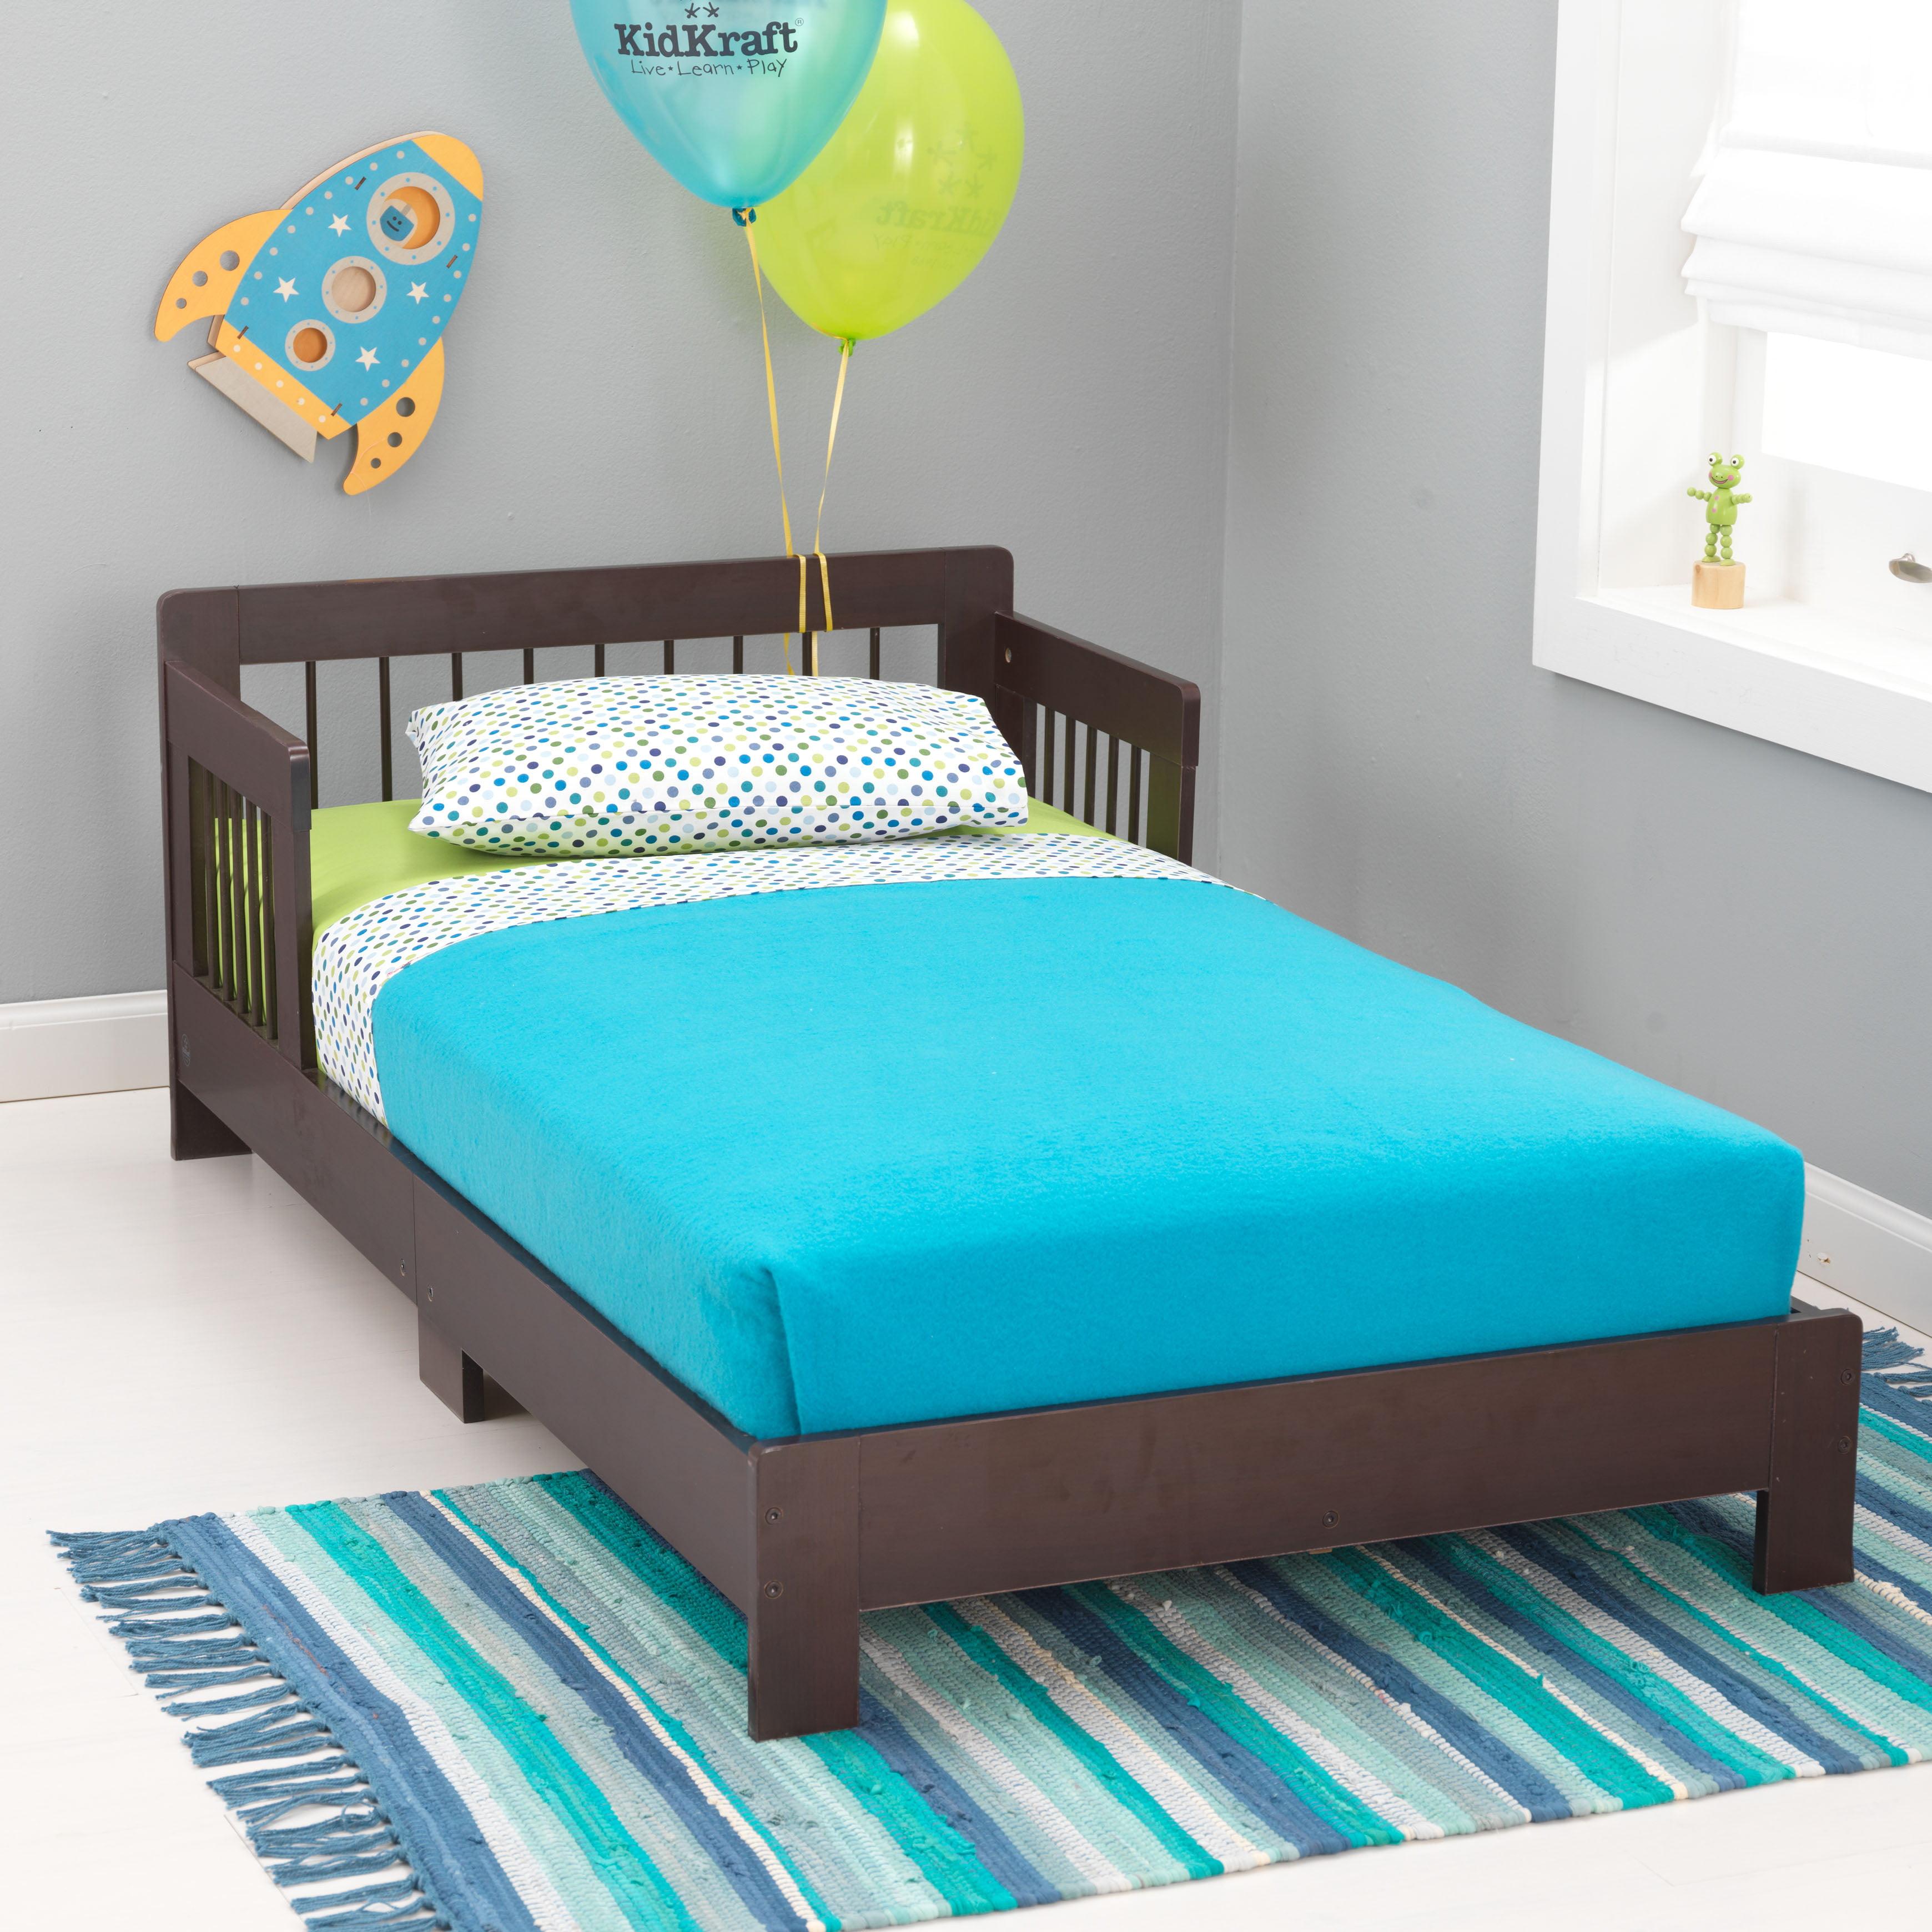 kidkraft houston wooden toddler bed with side rails and spindlekidkraft houston wooden toddler bed with side rails and spindle headboard honey walmart com